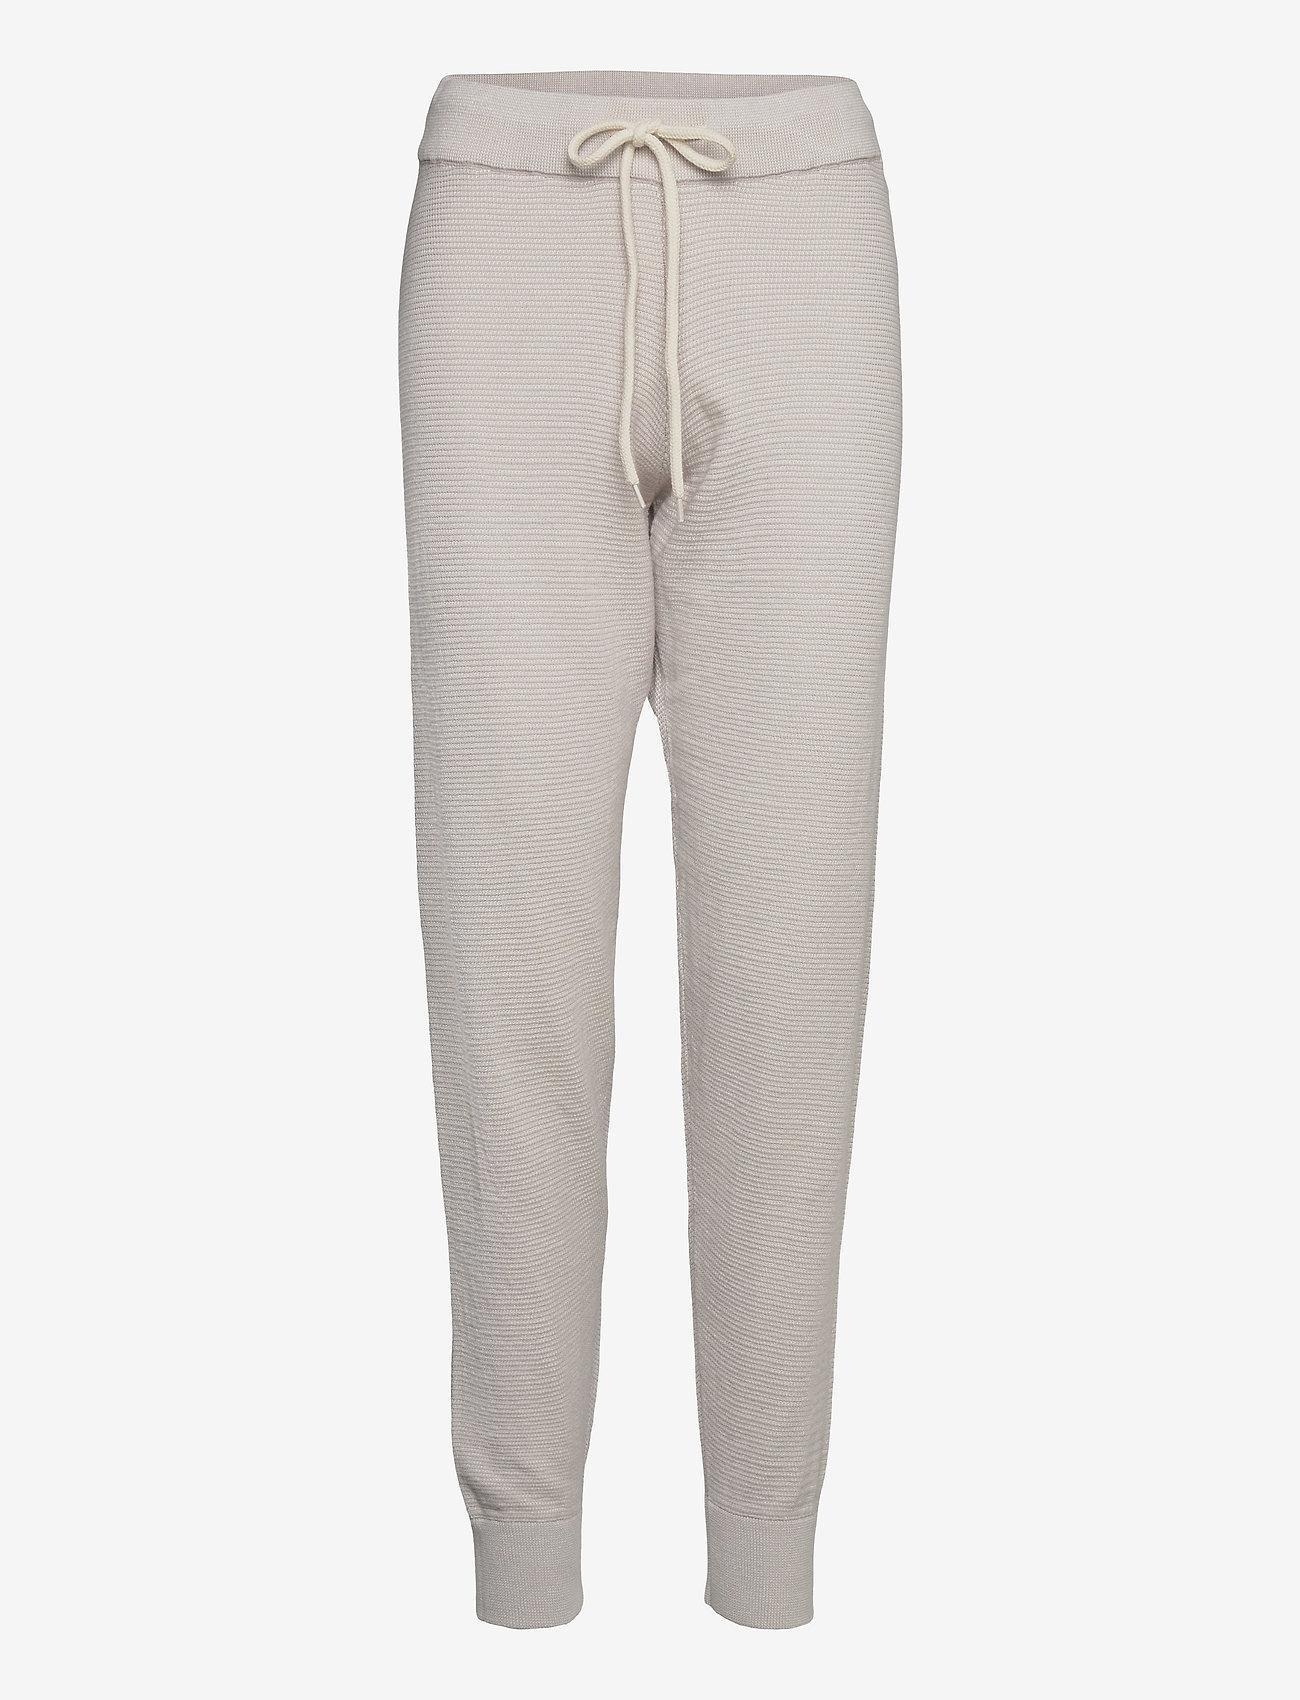 Varley - Alice Sweatpants 2.0 - kleidung - cobweb silver - 0